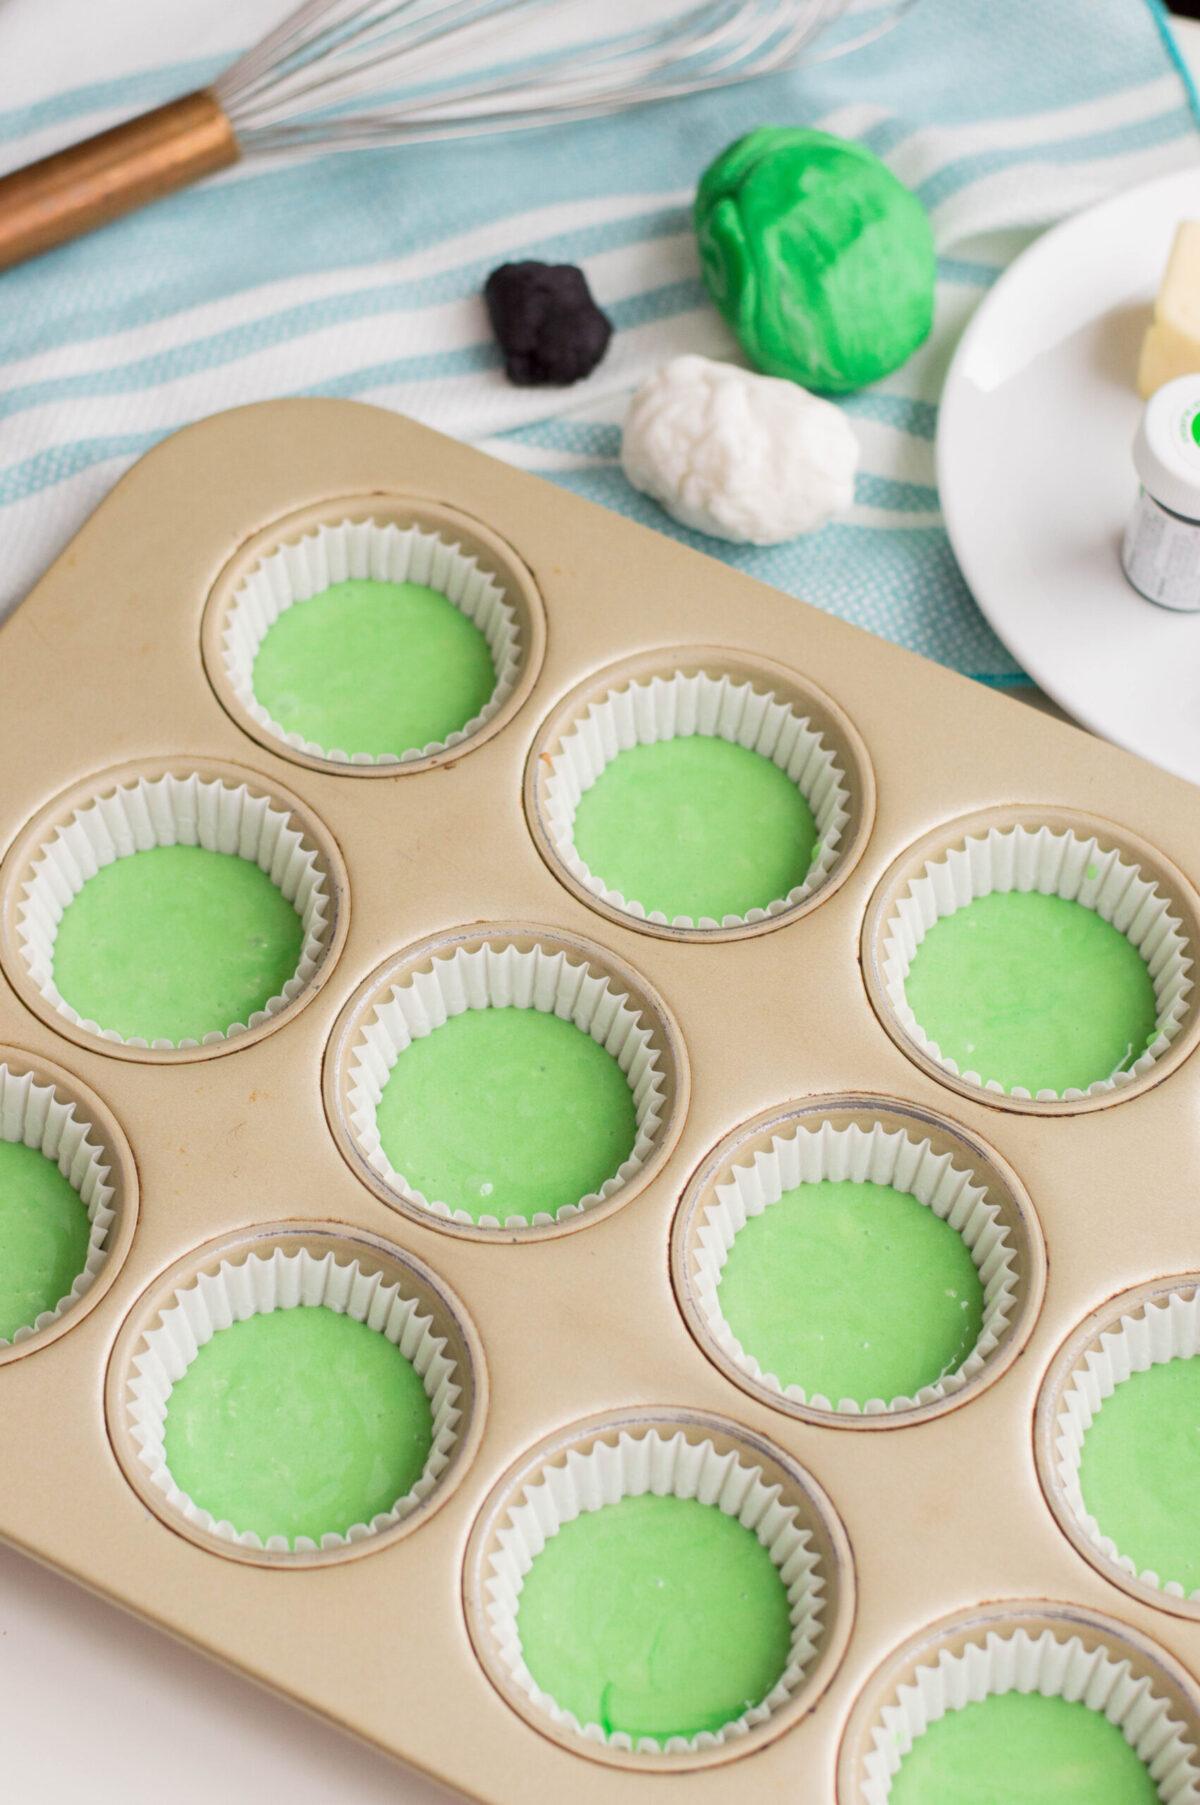 muffin tin with cupcake mix